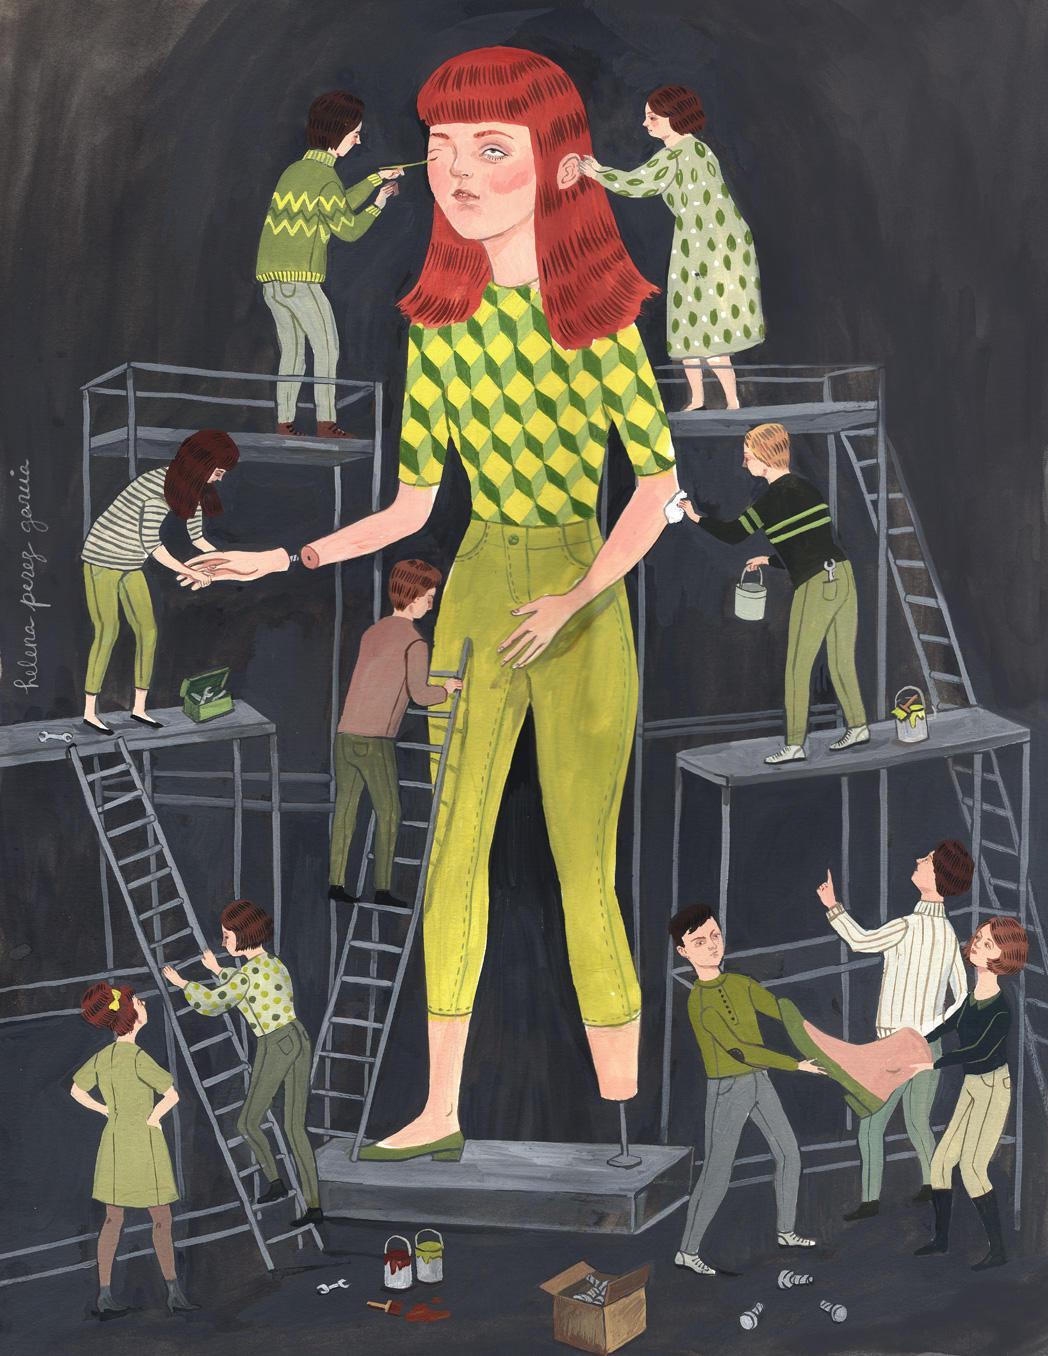 helena-perez-garcia-illustration-5